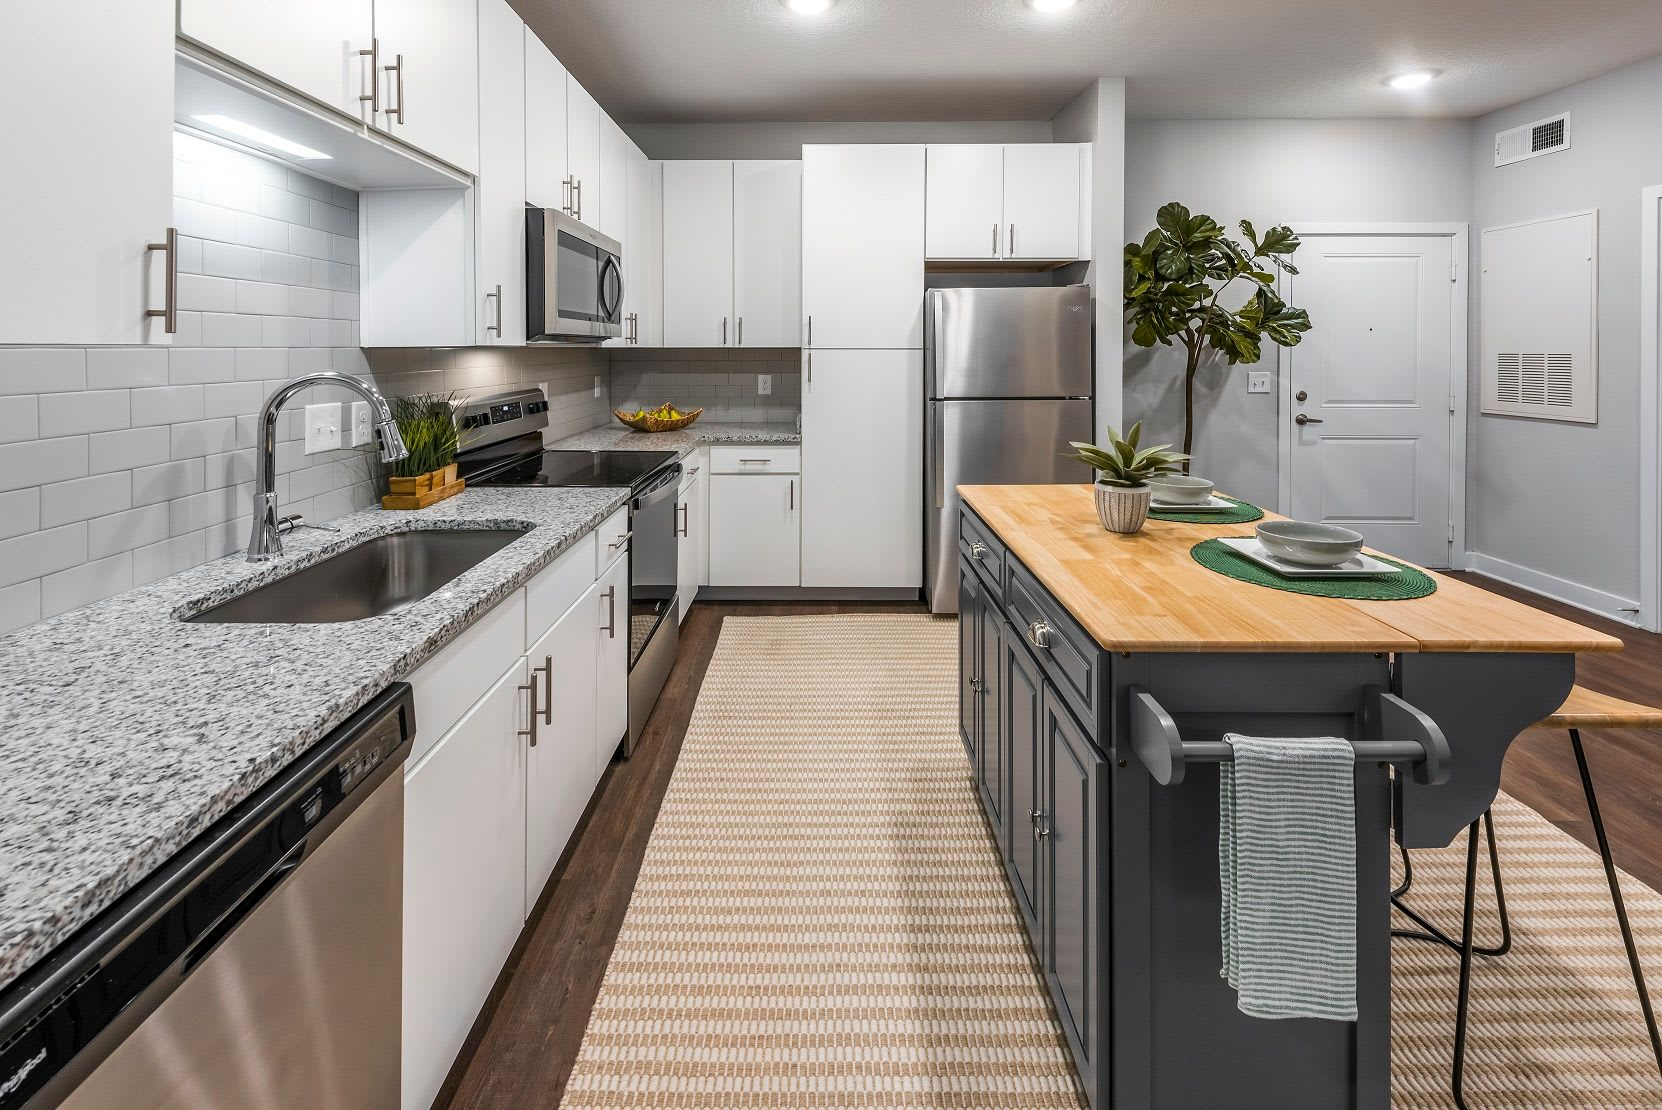 An updated kitchen at Argyle at Oakleaf Town Center in Jacksonville, Florida